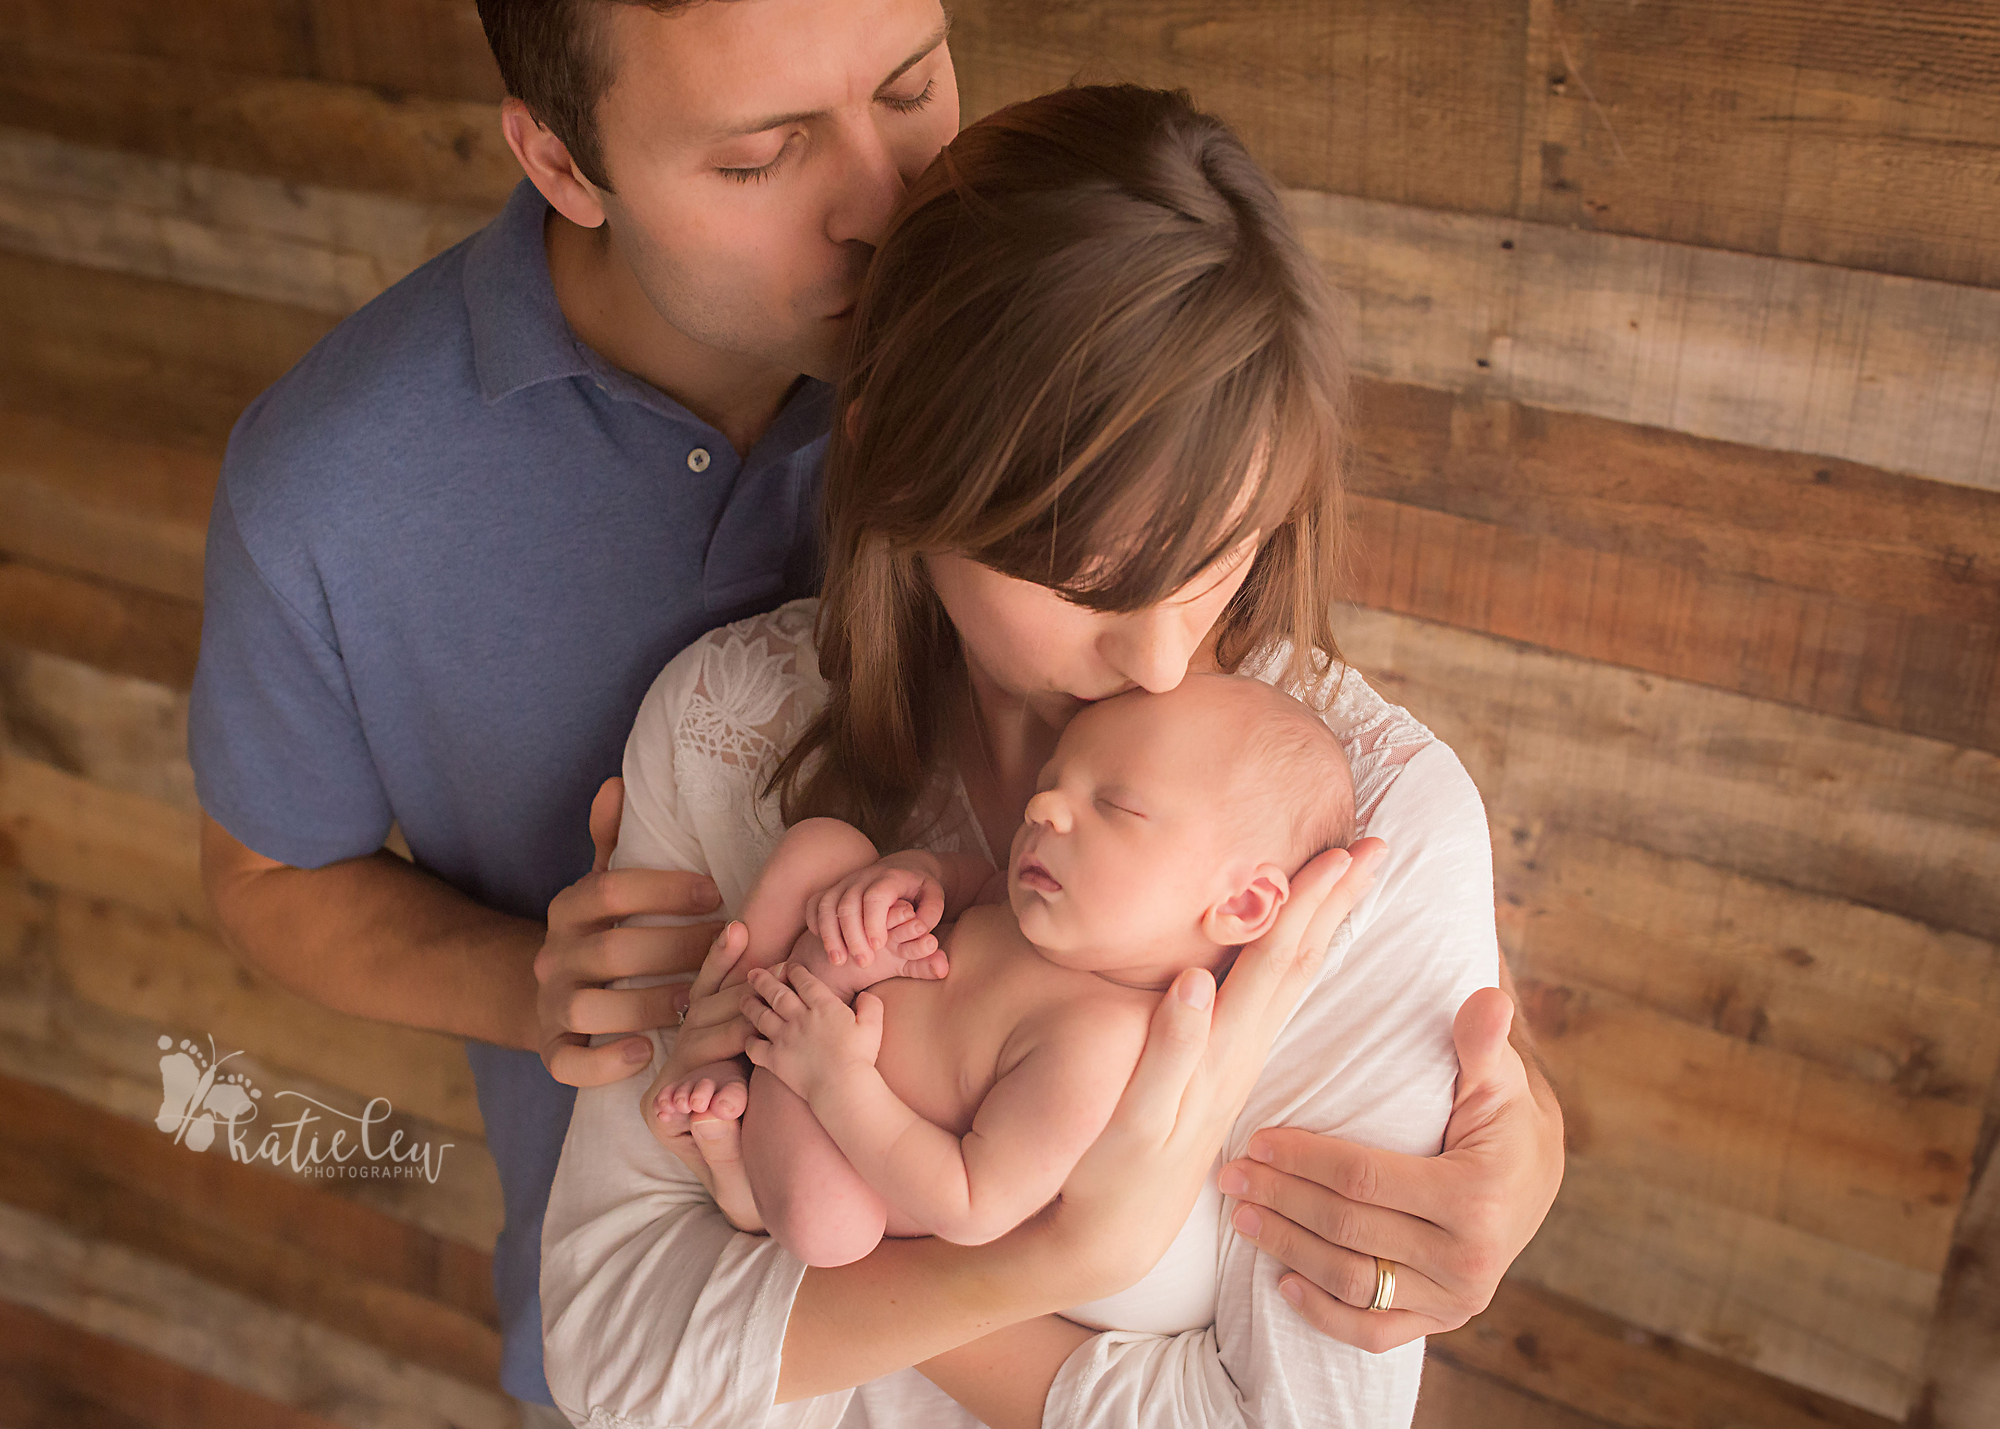 stillwater family newborn photographer